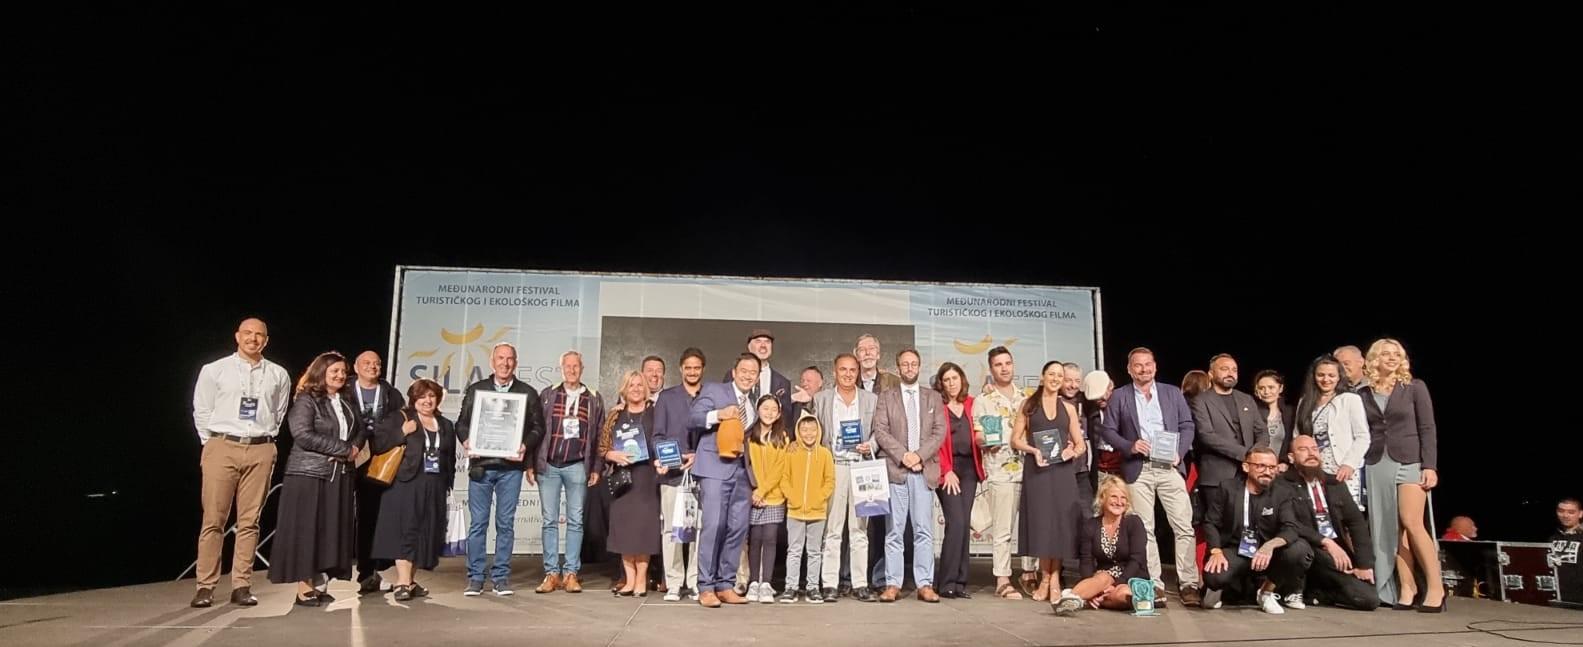 Silafest Award Ceremony 2021